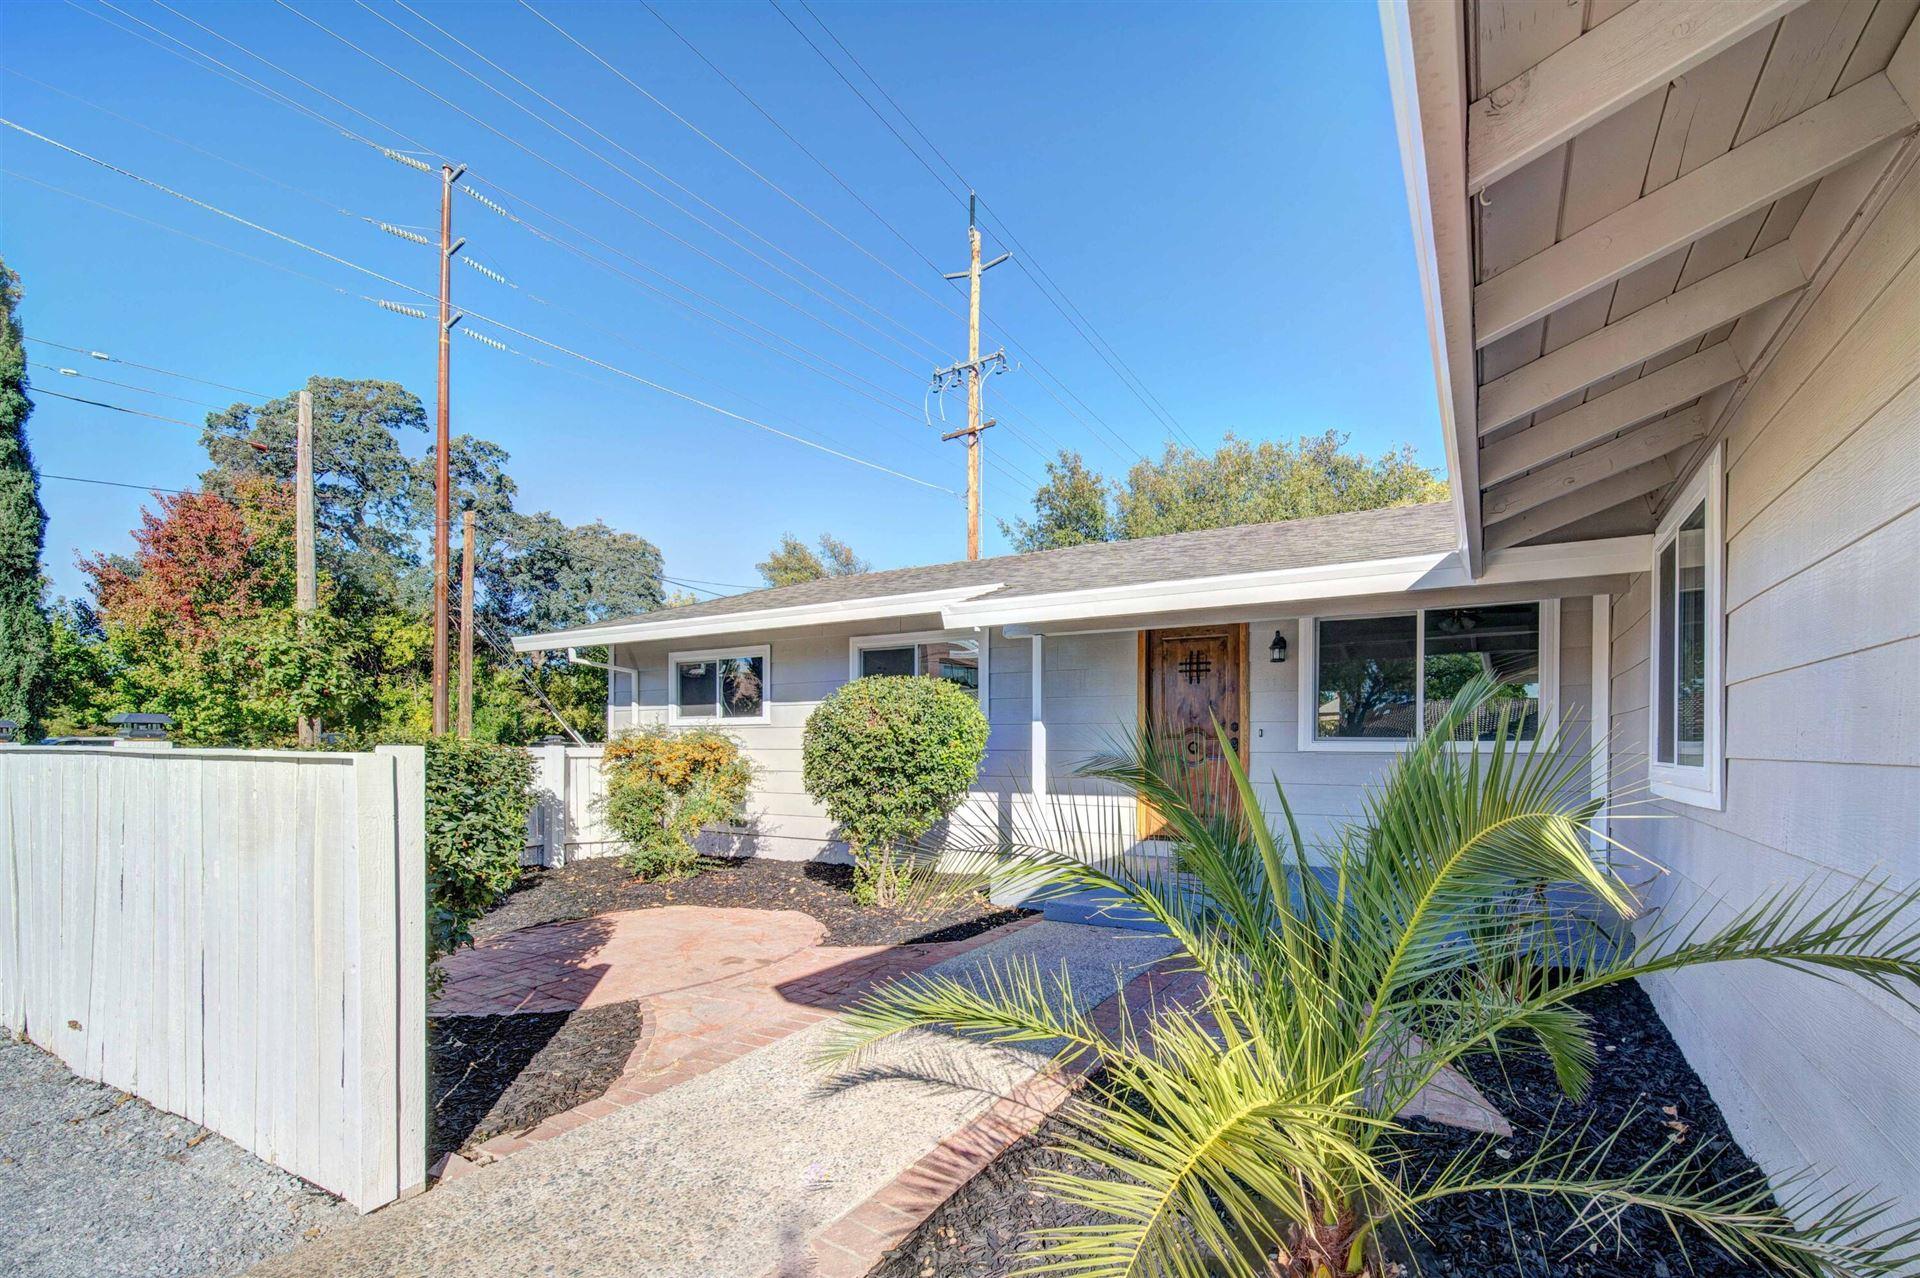 Photo of 1018 Pineland Dr, Redding, CA 96002 (MLS # 21-4896)